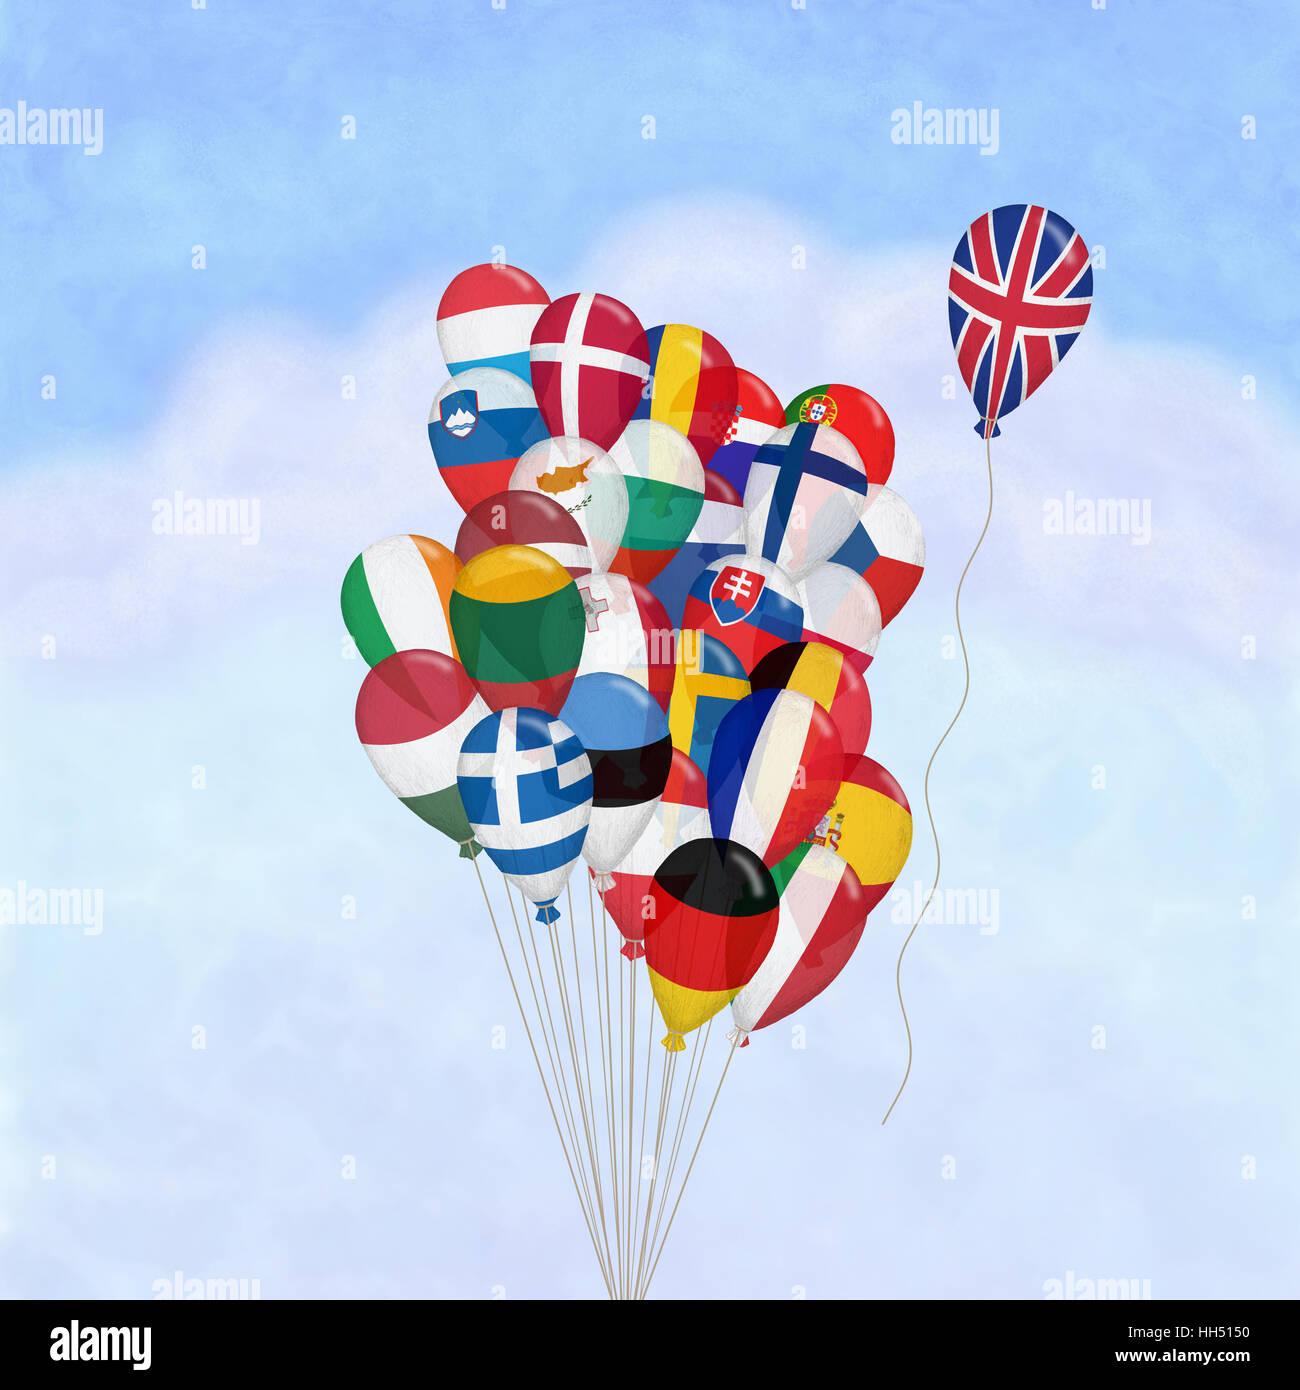 flags of eu showing Brexit,uk leaving eu, break up of EU,leave EU,eu flags, uk flag leaving eu flags, concept,illustration, - Stock Image